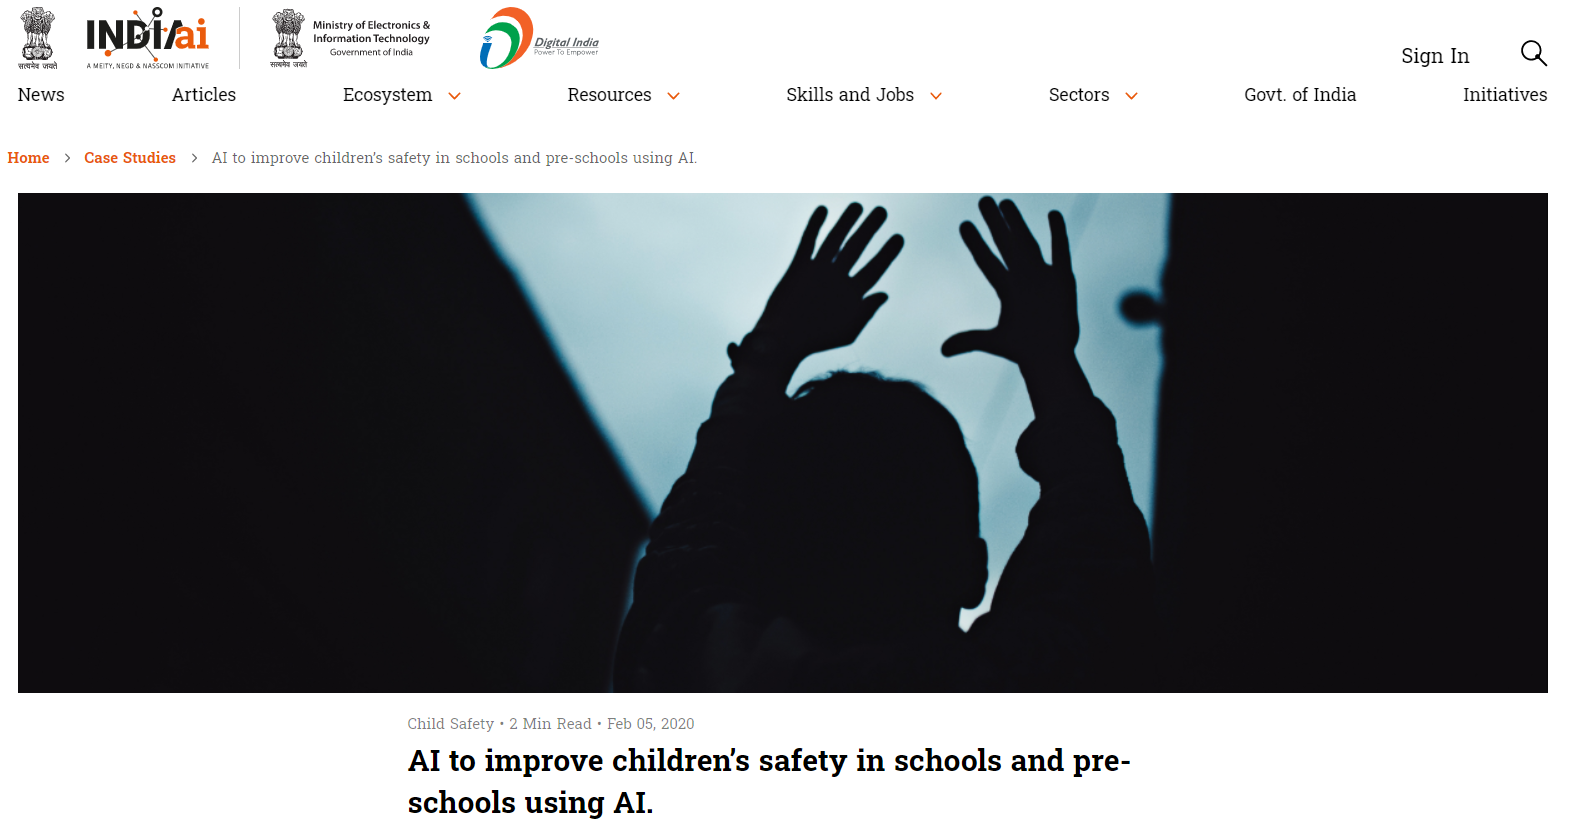 AI to improve children's safety in schools and pre-schools using AI.